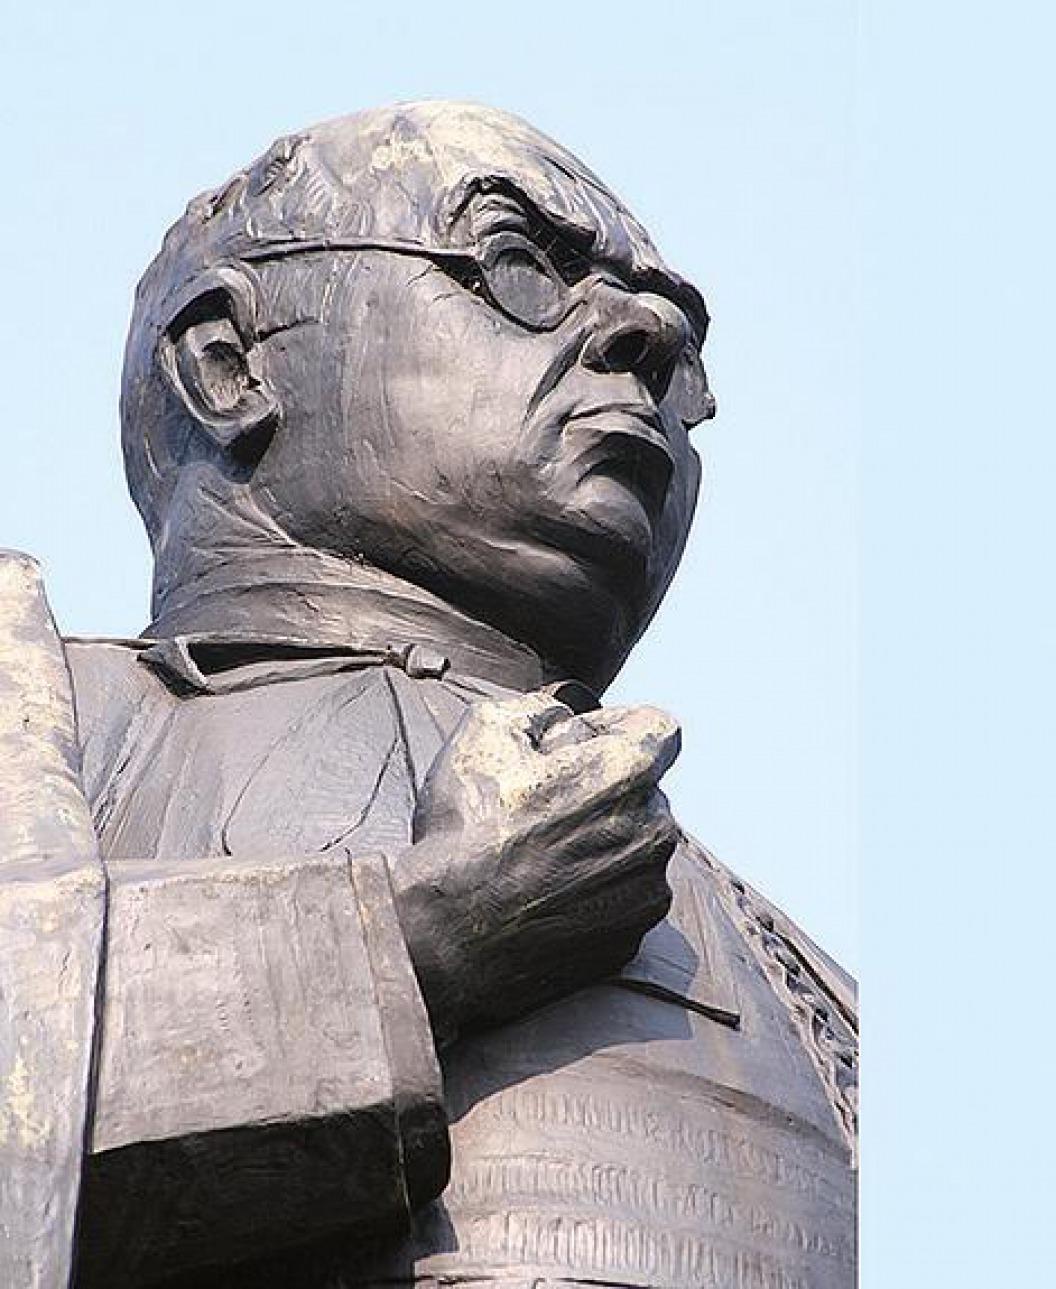 Dr. Schaepman monument